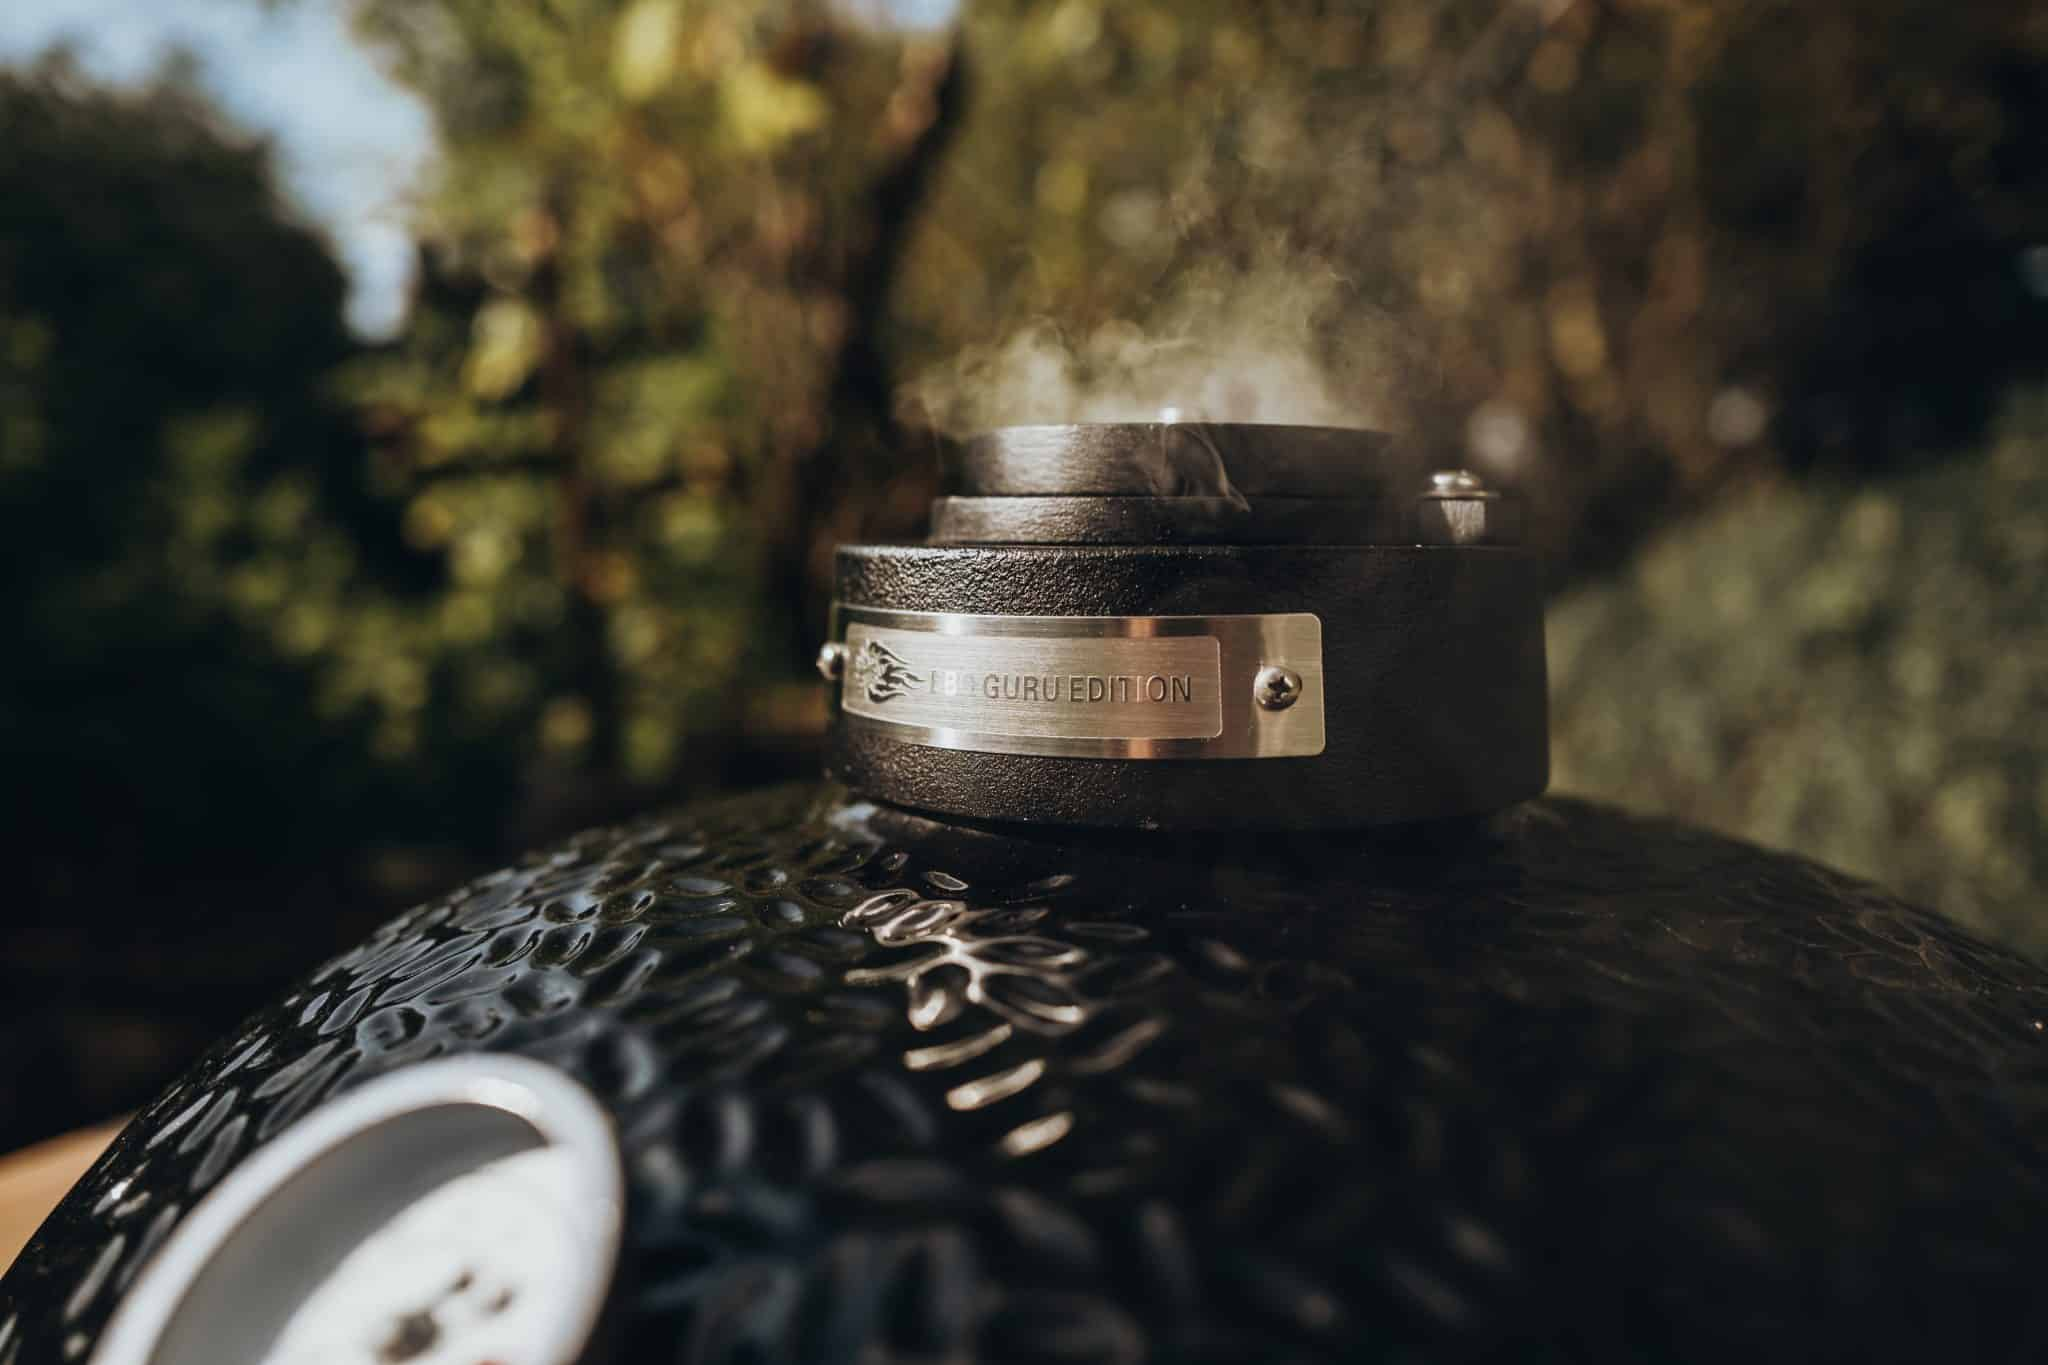 Monolith LeChef BBQ-Guru